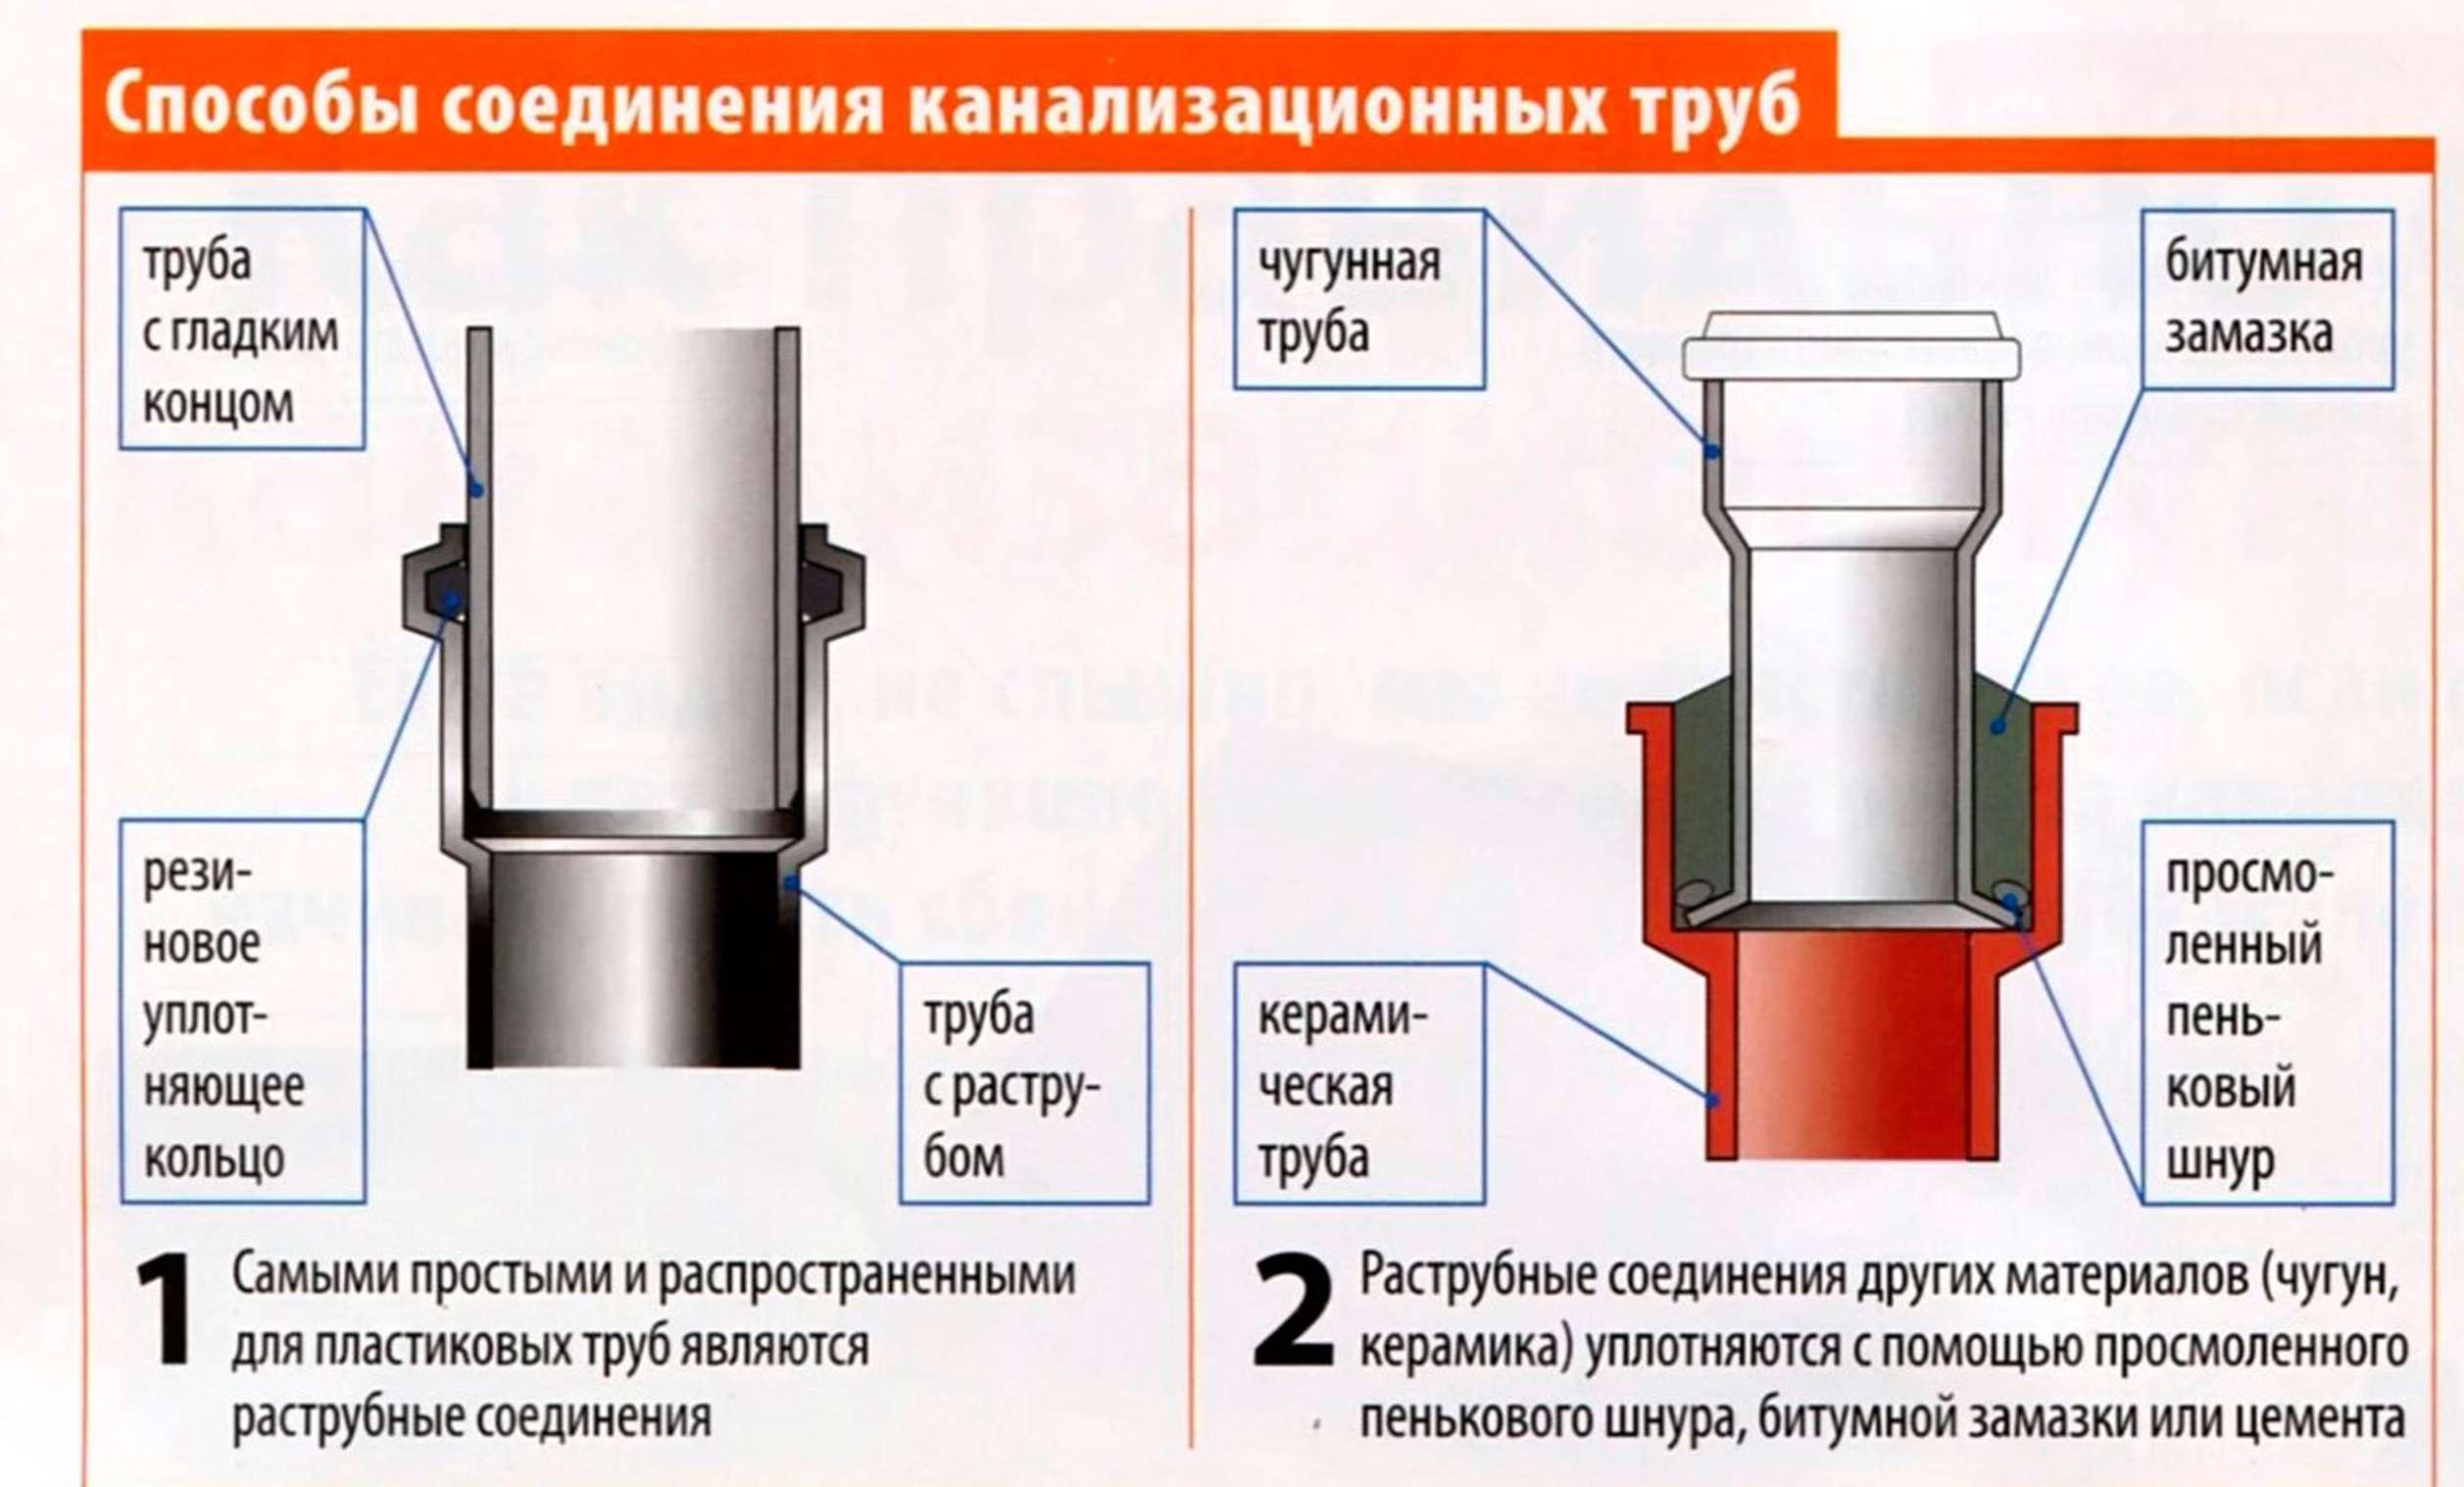 сантехника схема канализатции видео